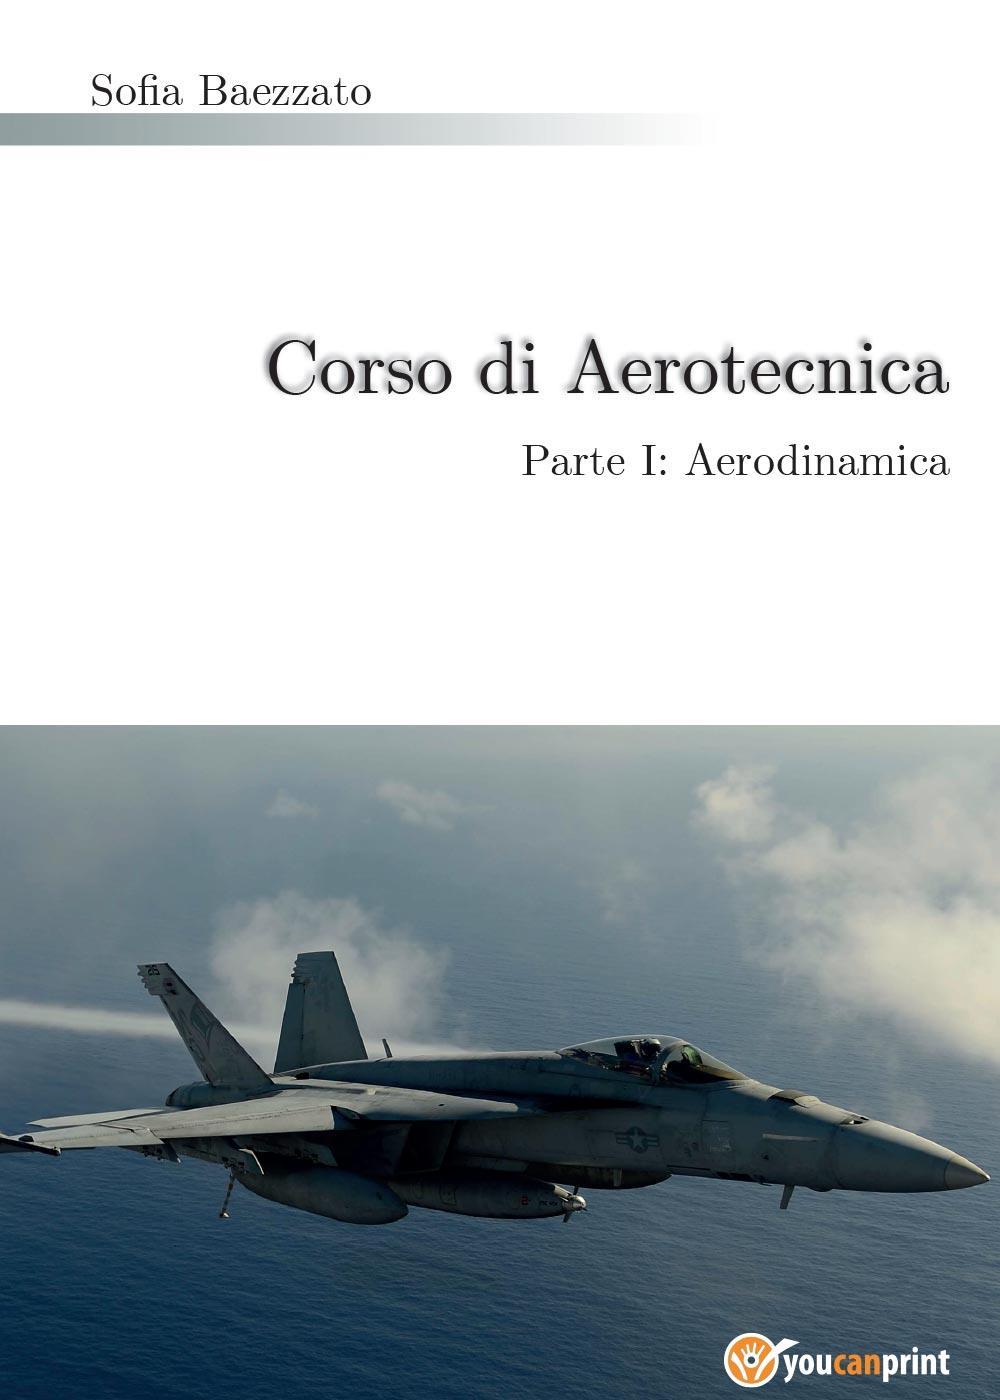 Corso di Aerotecnica Parte I: Aerodinamica